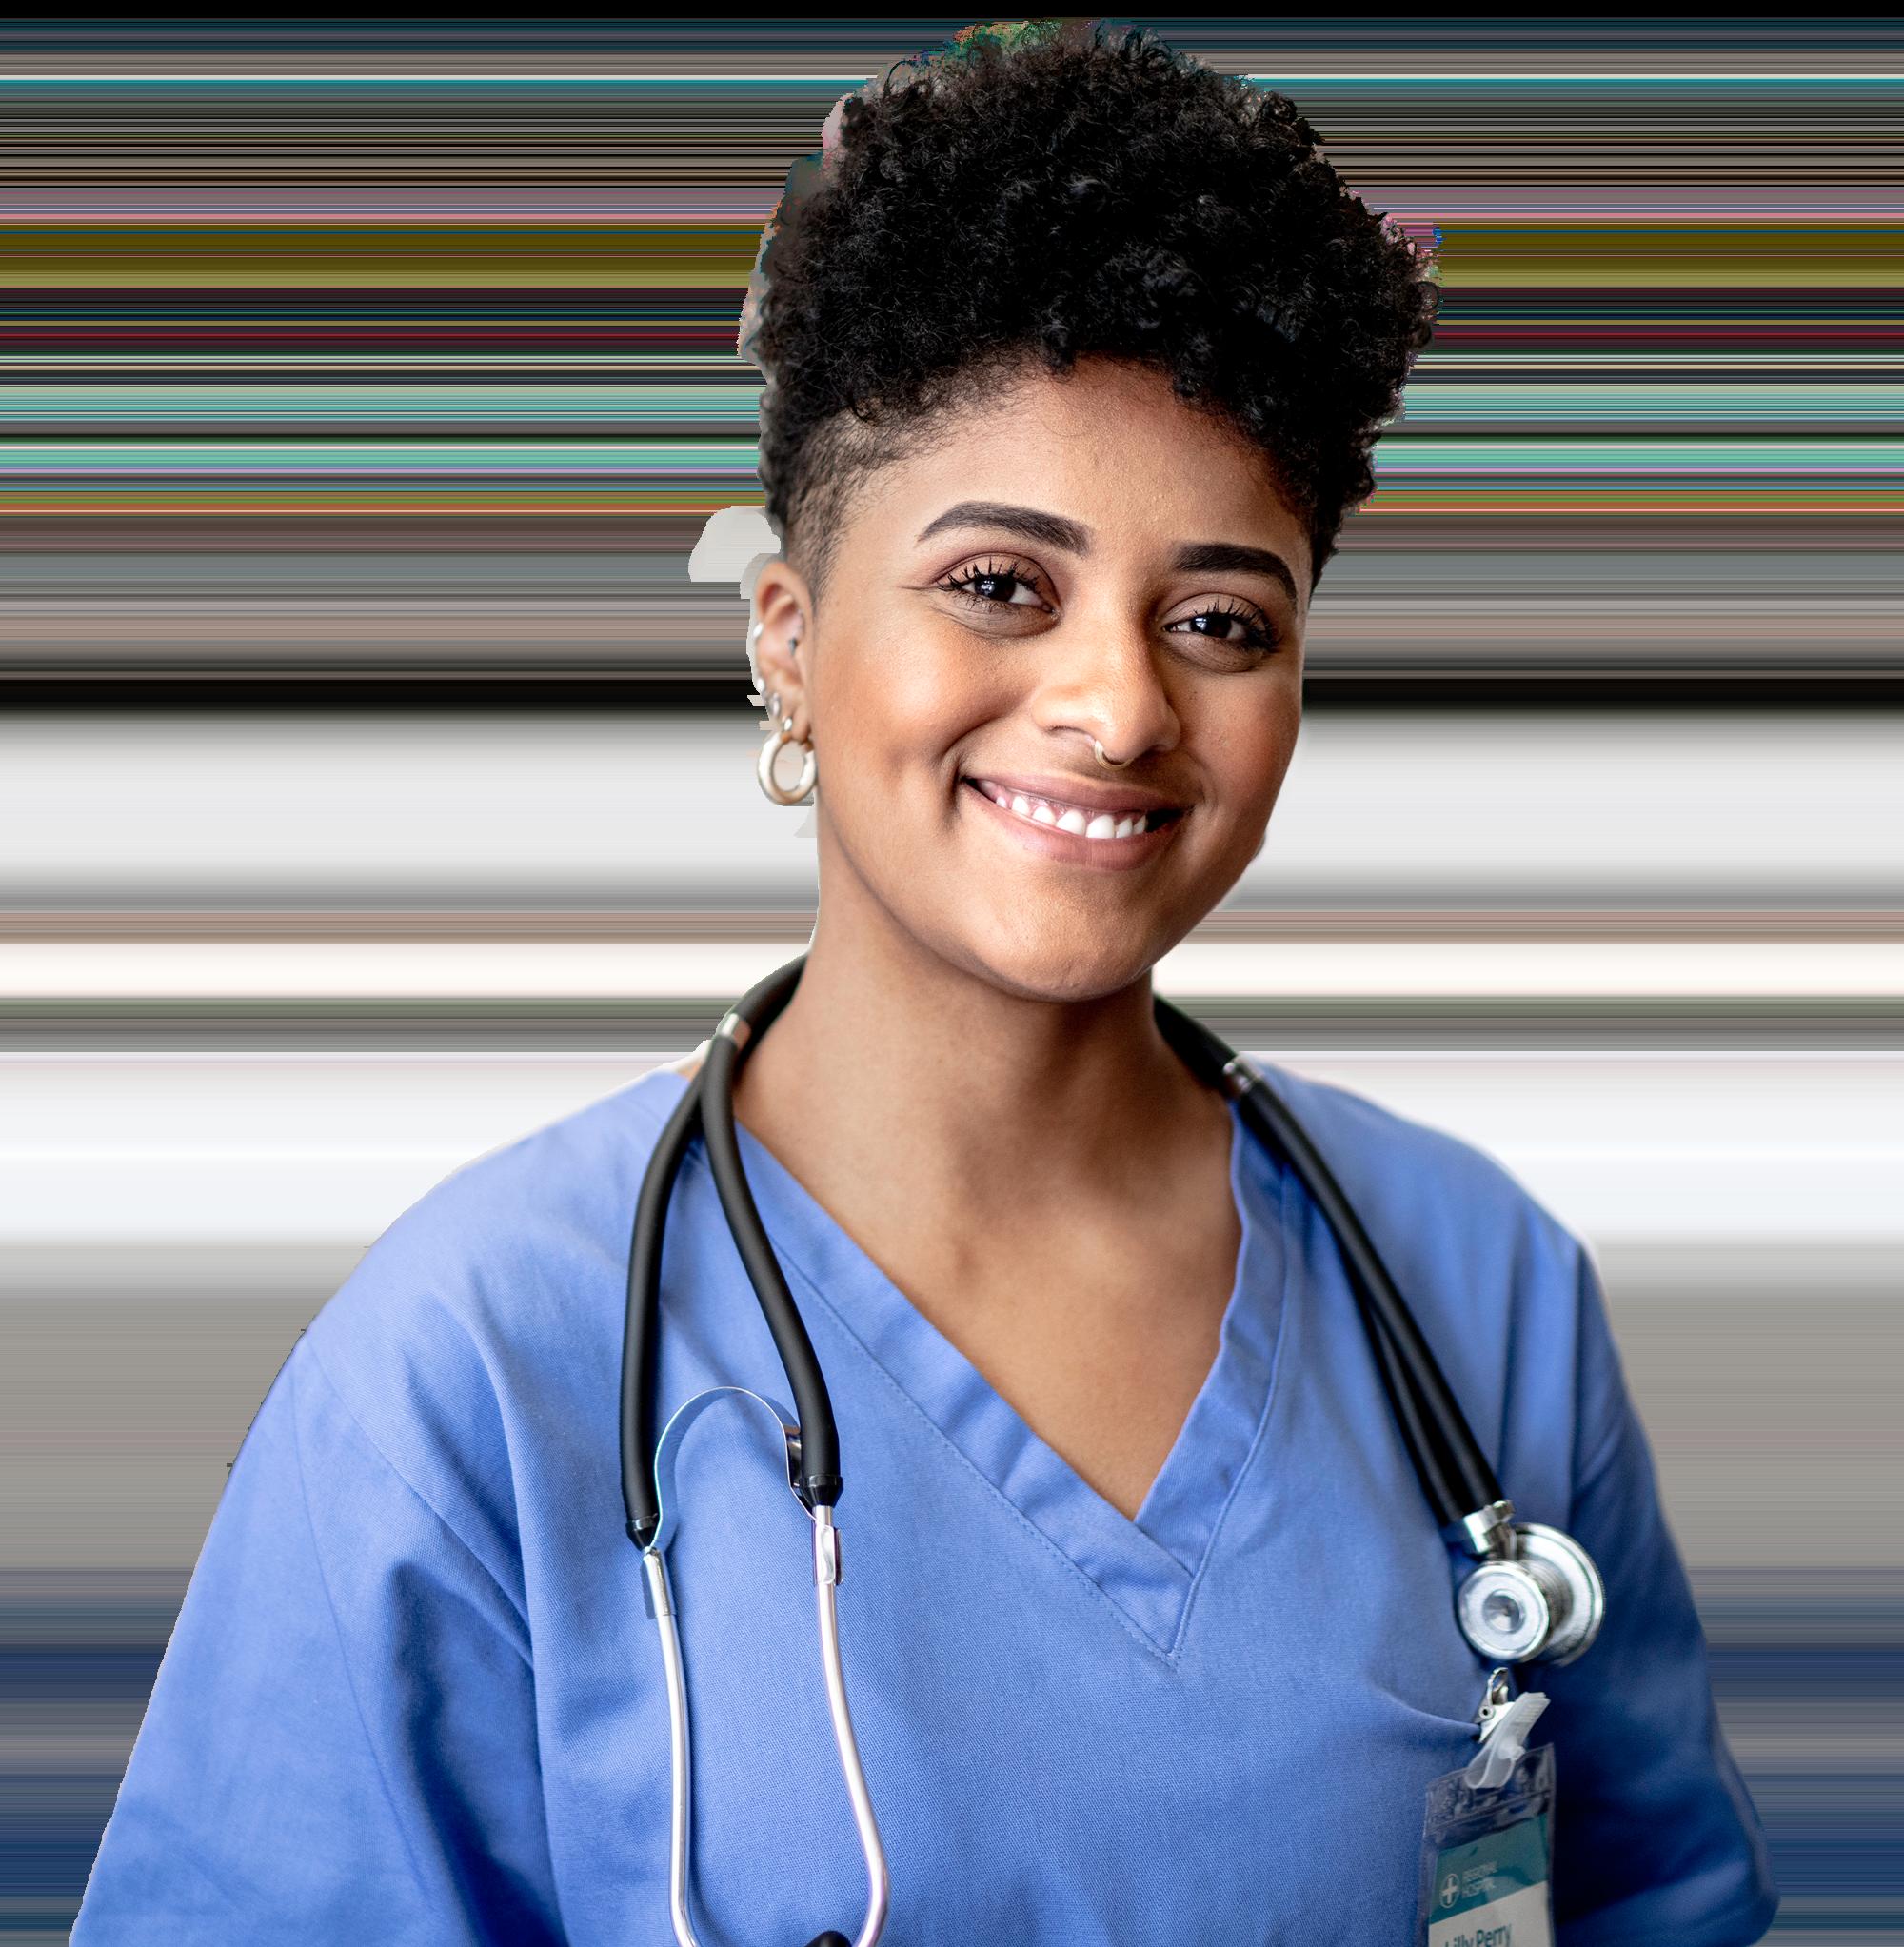 close-up image of a smiling female nurse